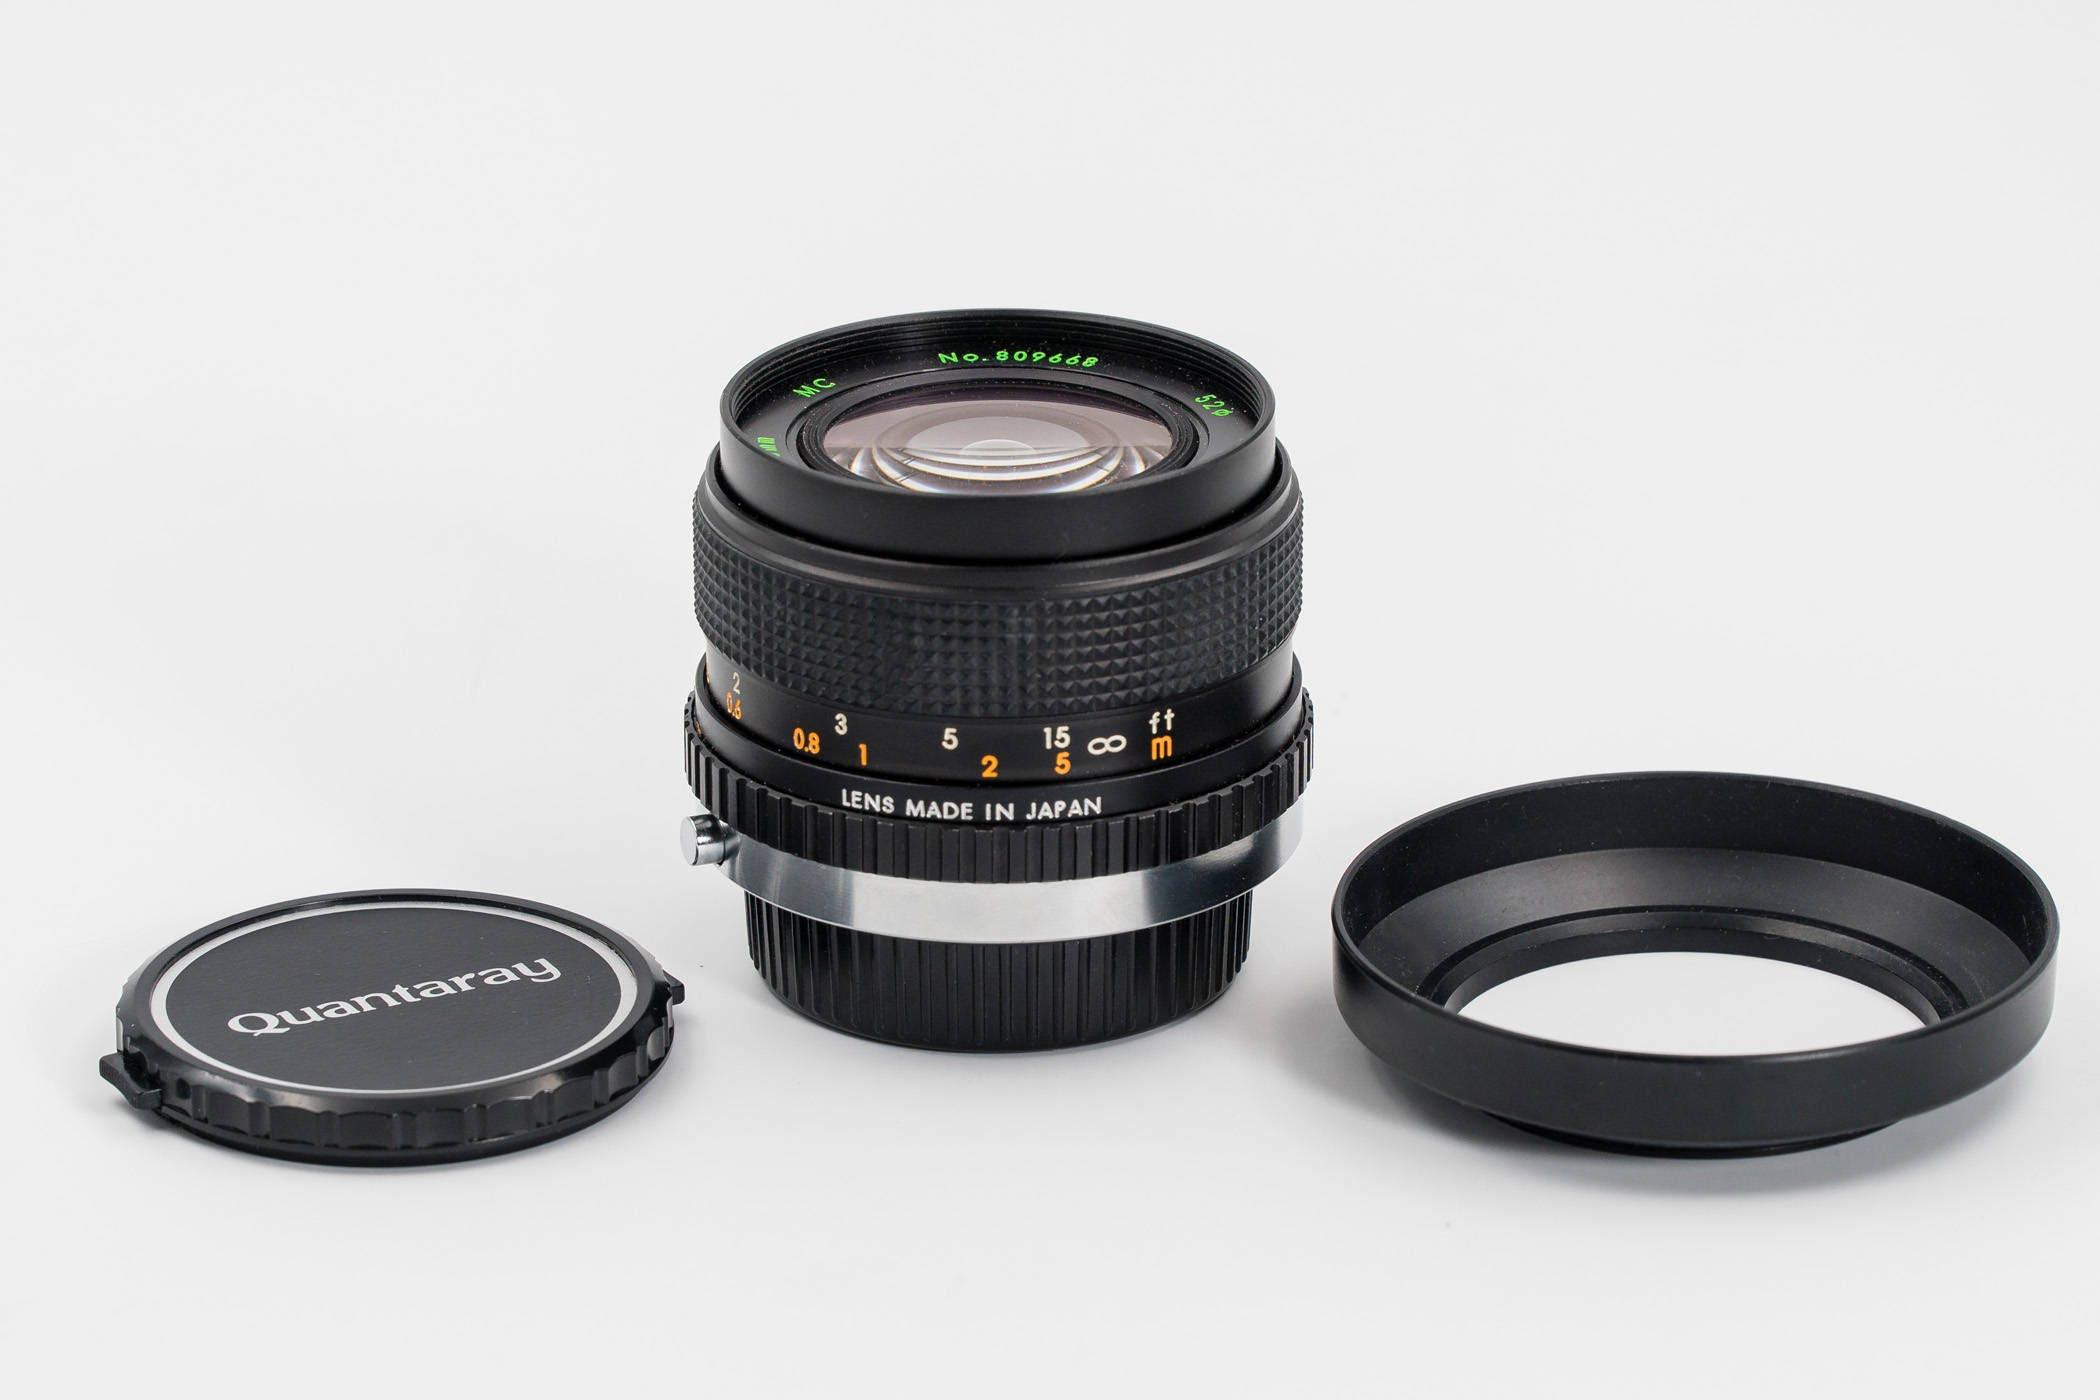 quantaray sigma 28mm f2 8 manual lens for olympus om mount cameras rh vintagecamerastore us Quantaray Color Wheel Quantaray Lenses